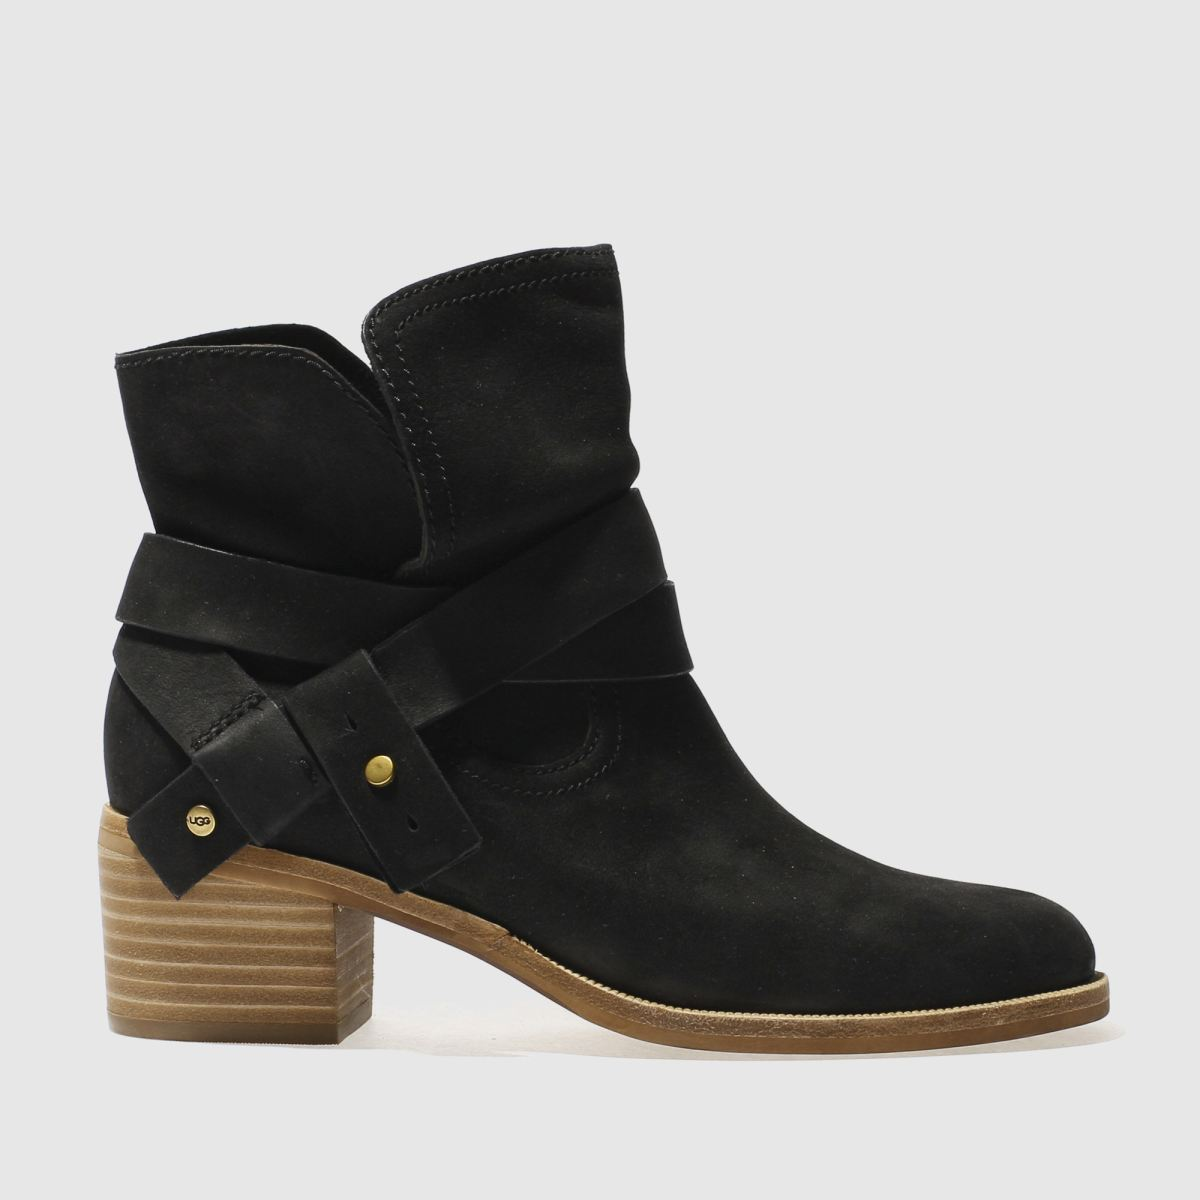 UGG Australia Ugg Black Elora Boots